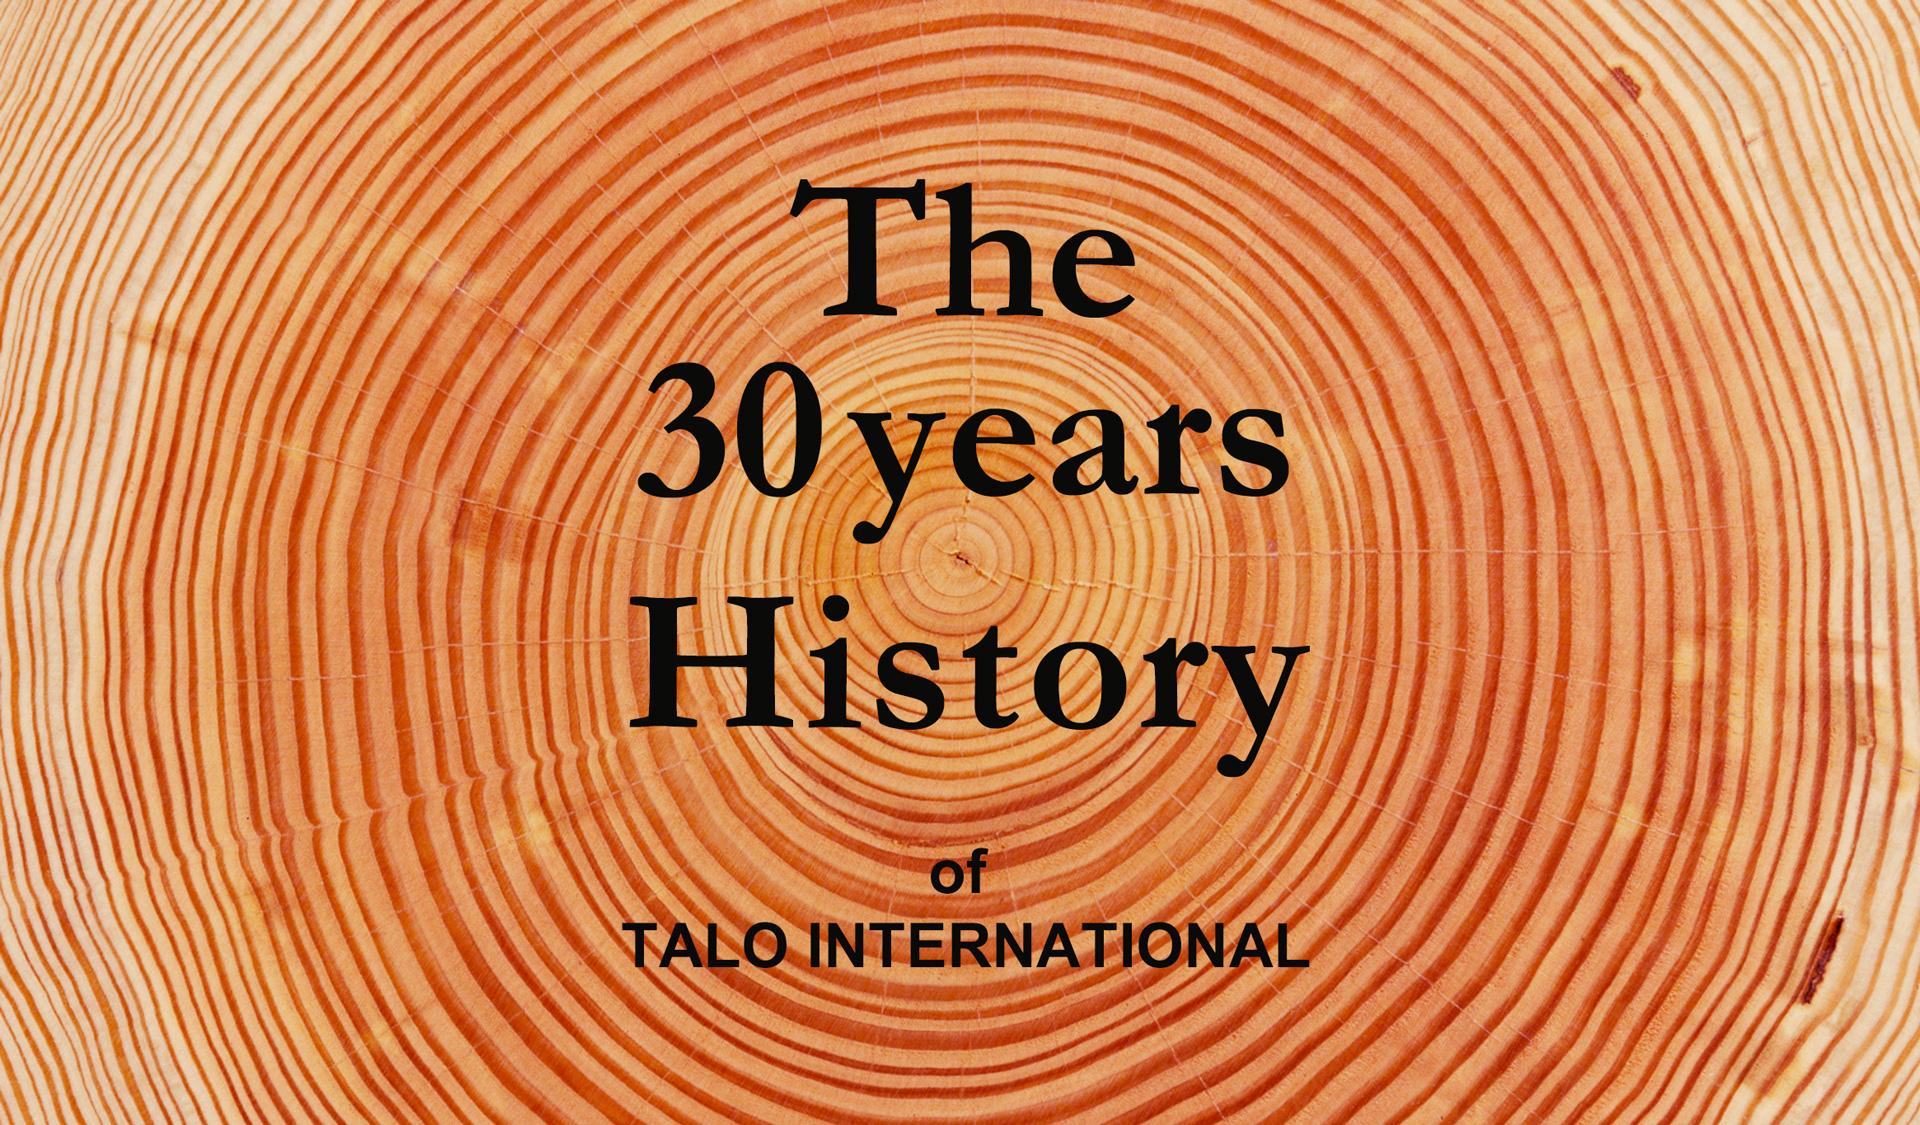 The 30years history of TALO INTERNATIONAL